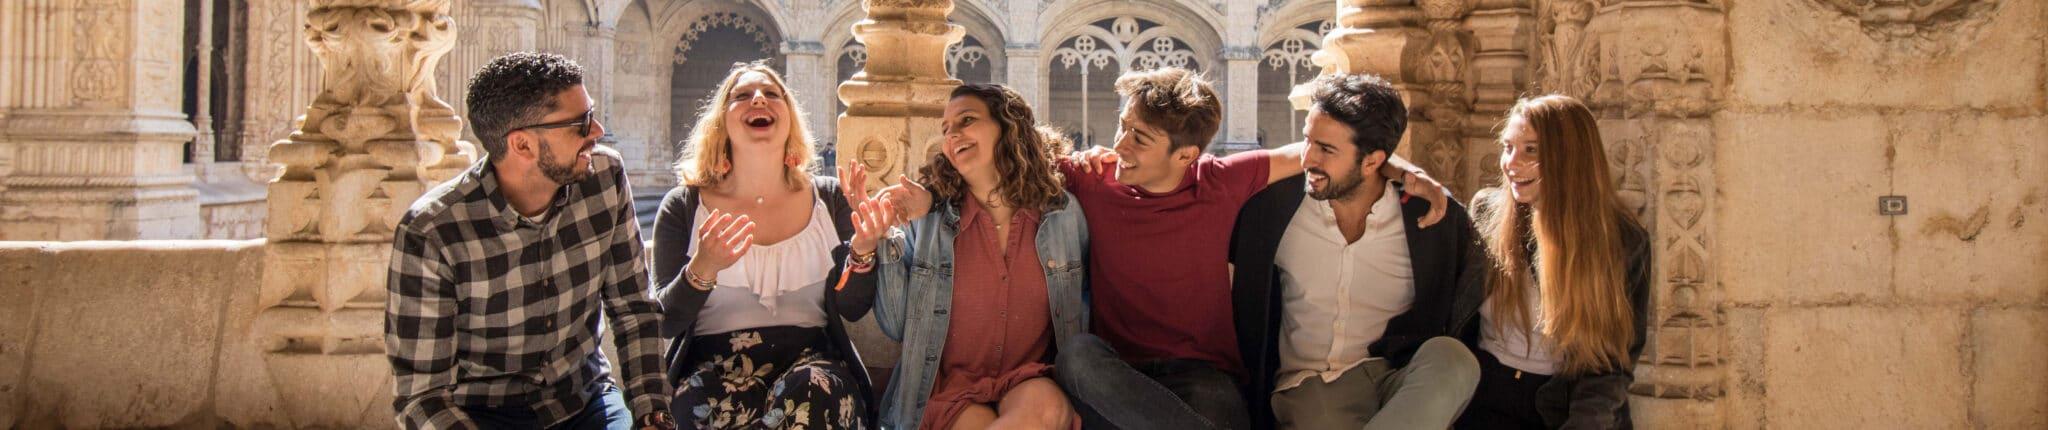 Custom semester abroad in Spain